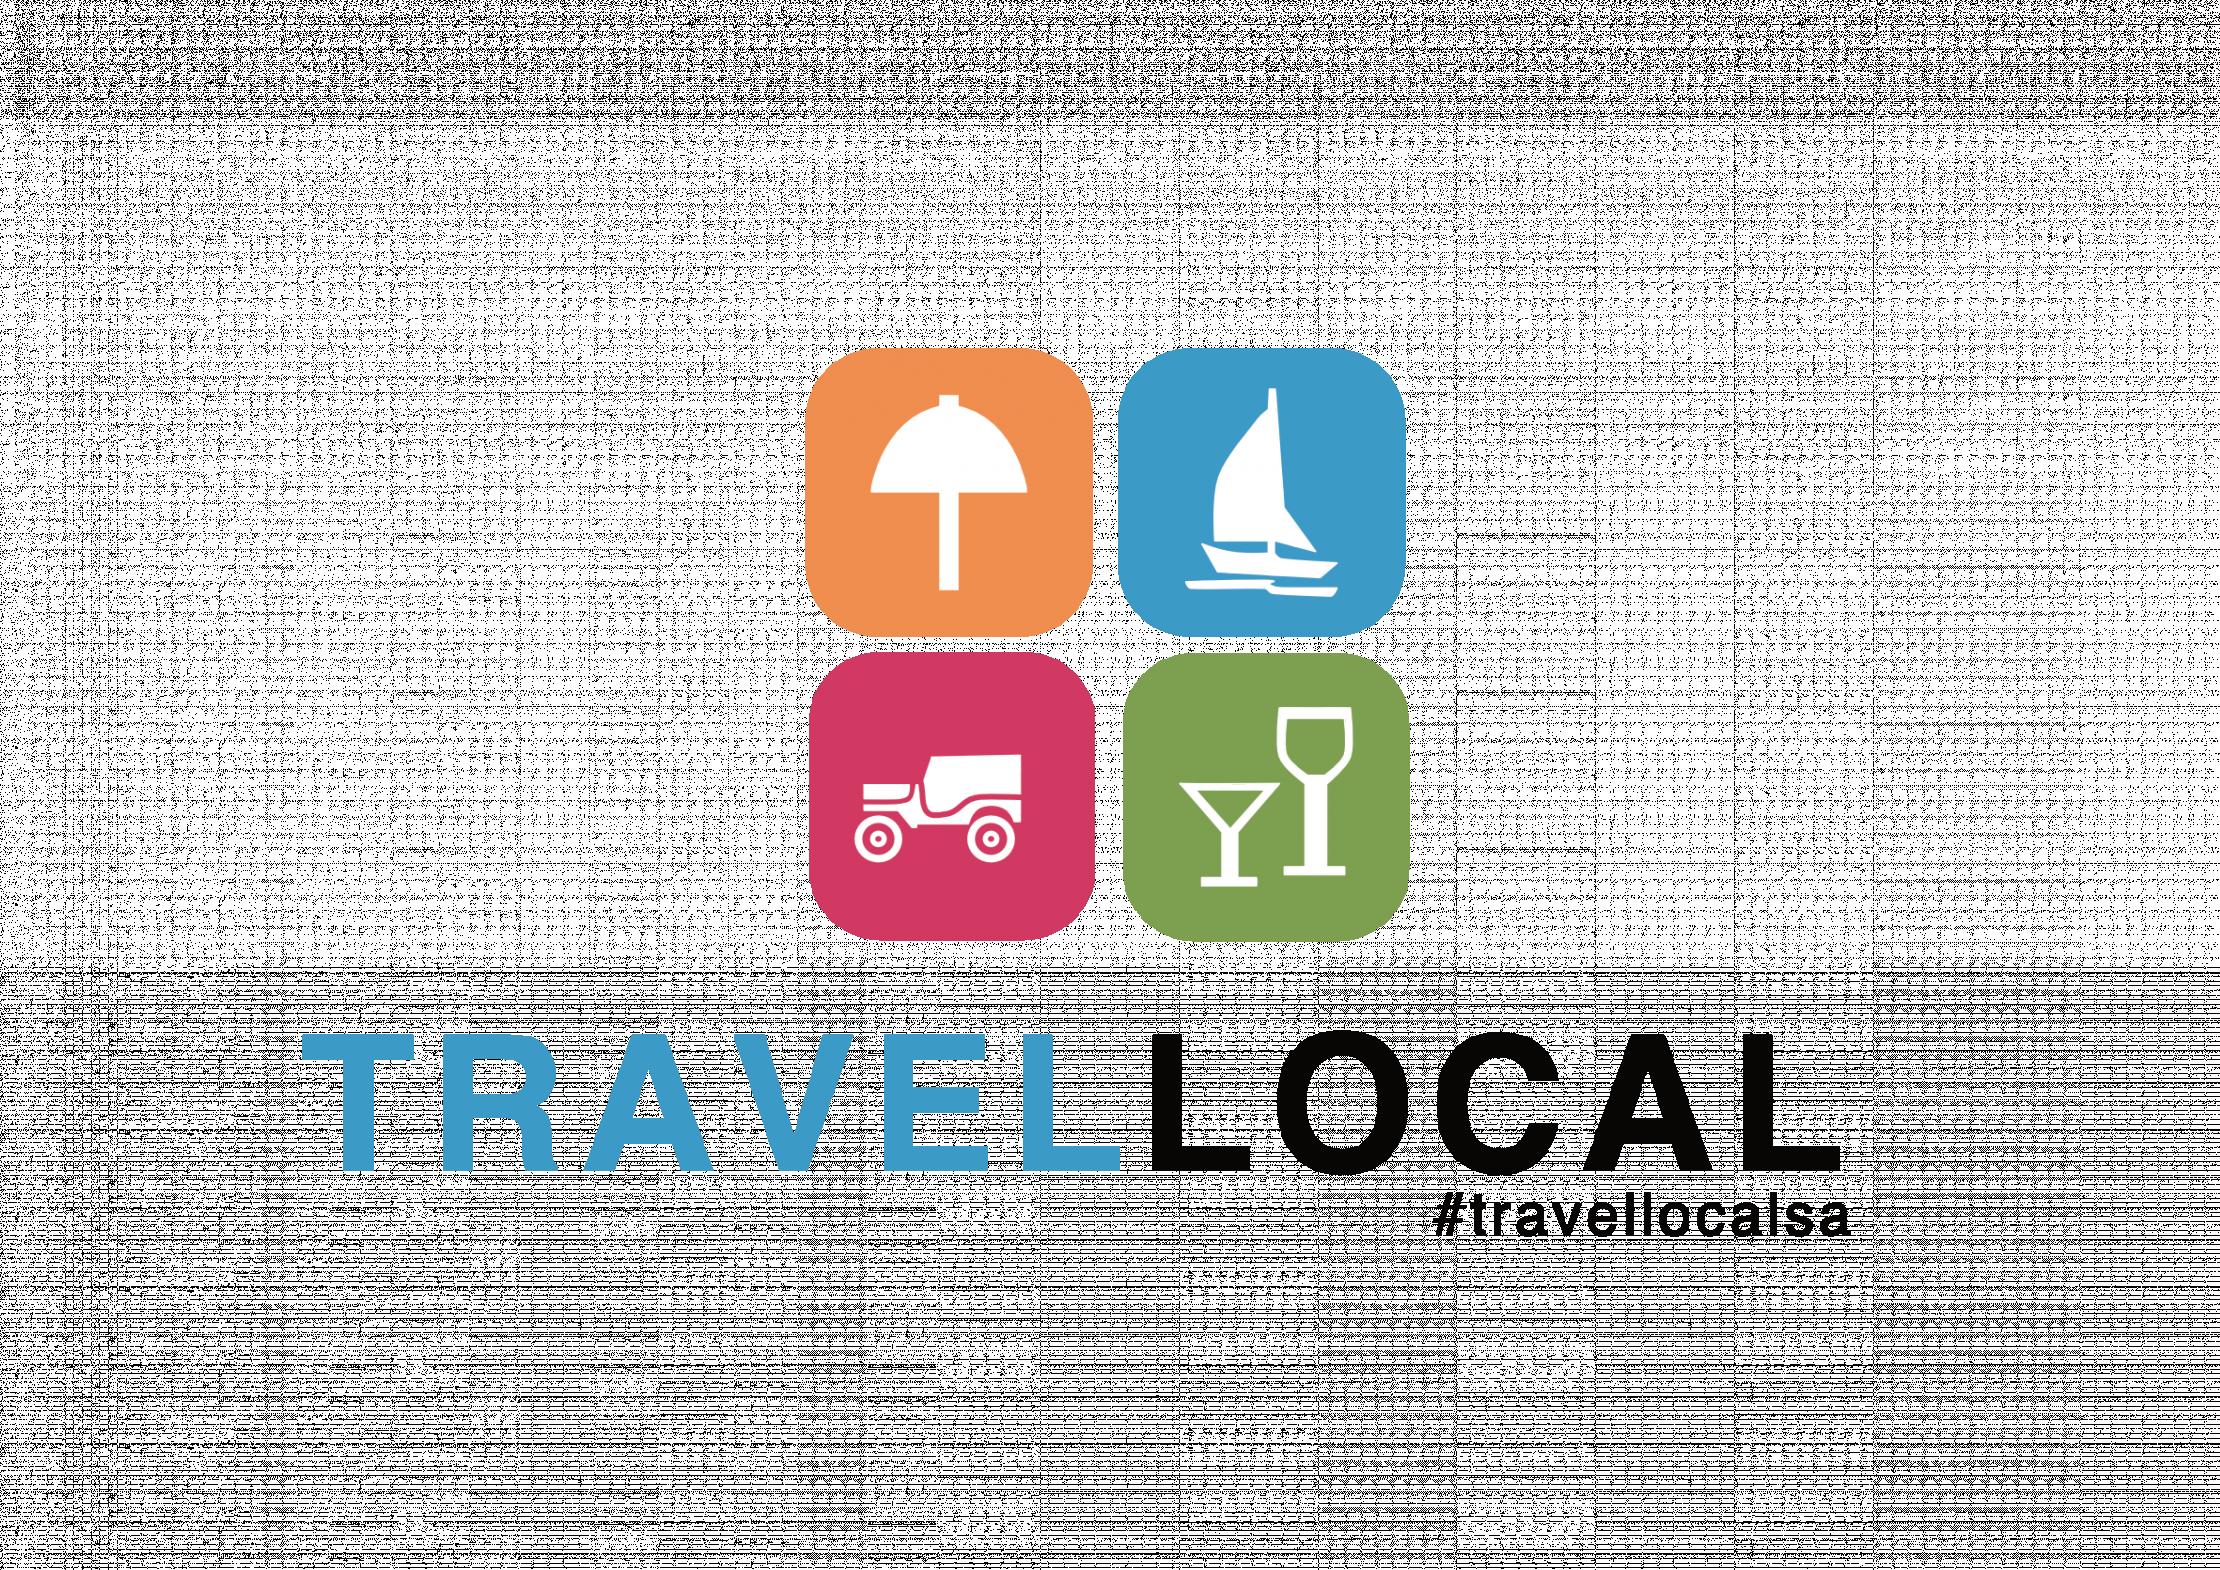 #travellocalsa